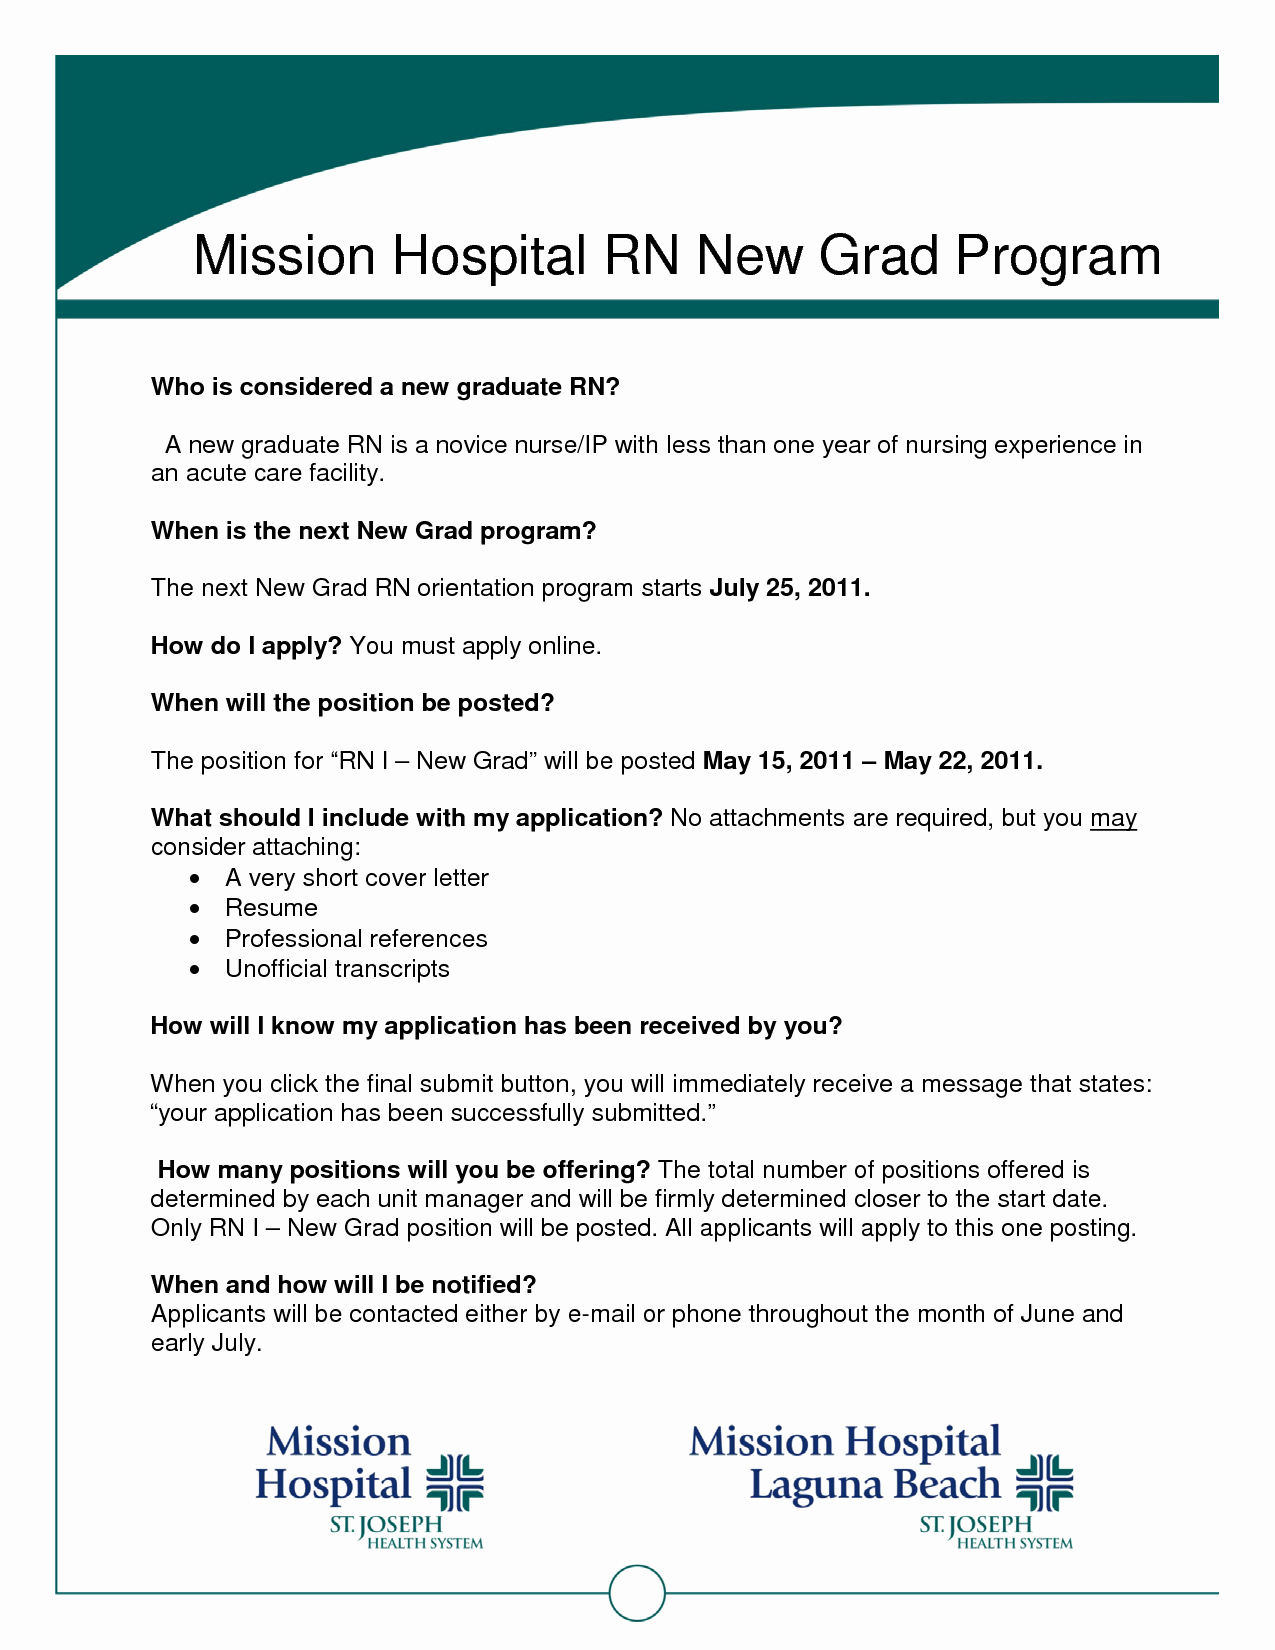 New Graduate Nurse Resume Examples Awesome Graduate Nurse Resume Template Resume Ideas